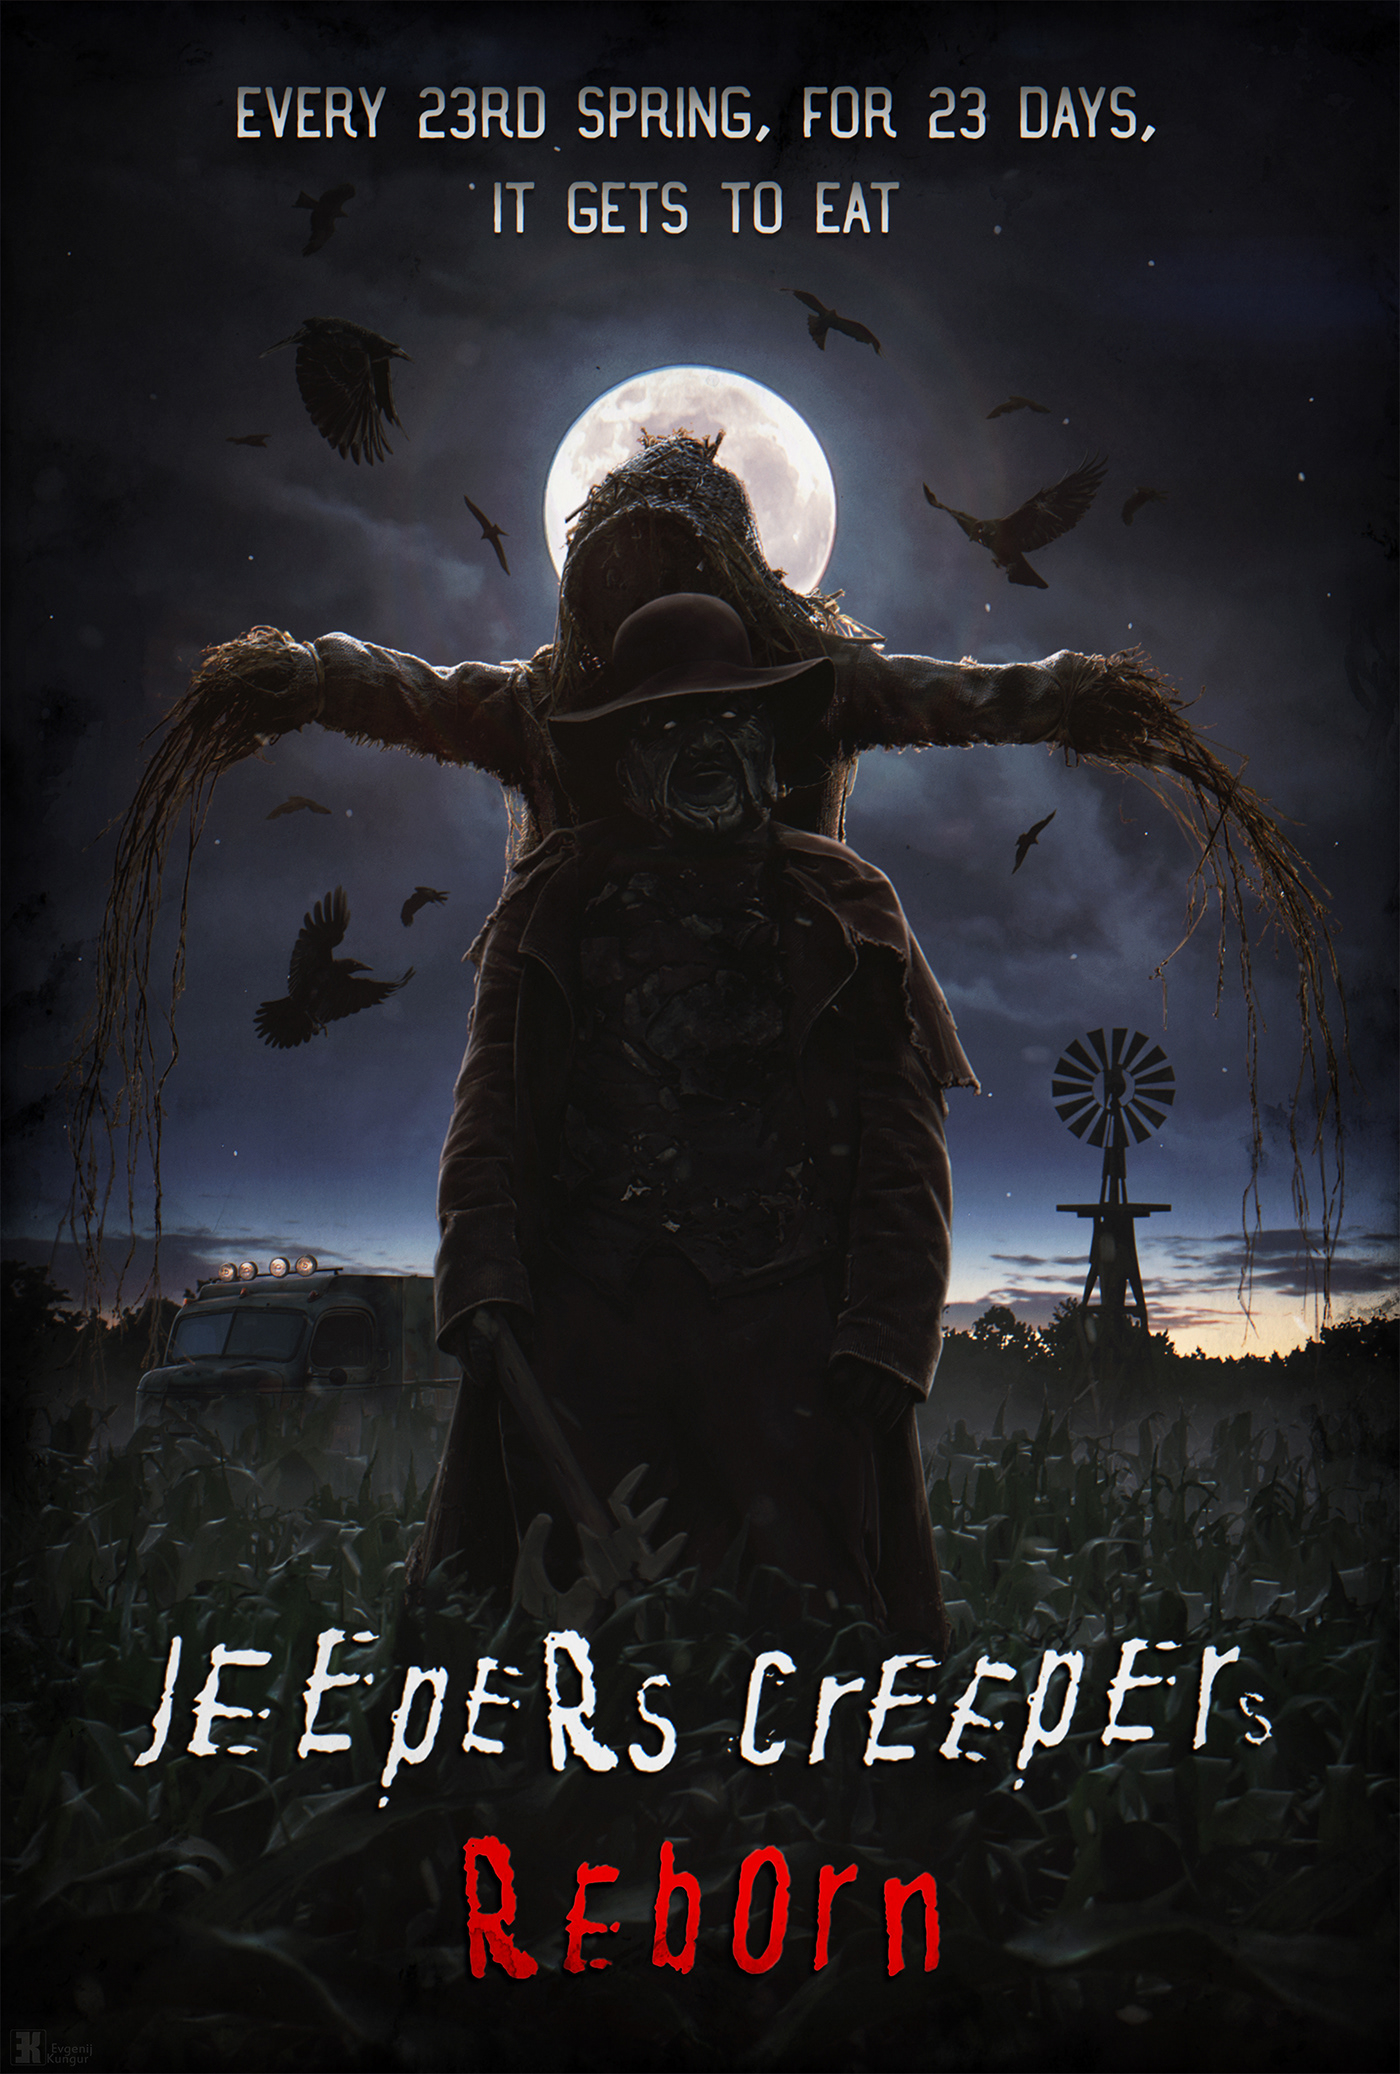 #conceptart #cornfield #hatchet #horror   #hunter   #jeeperscreepers #jeeperscreepersreborn #mattepainting #night  #survival